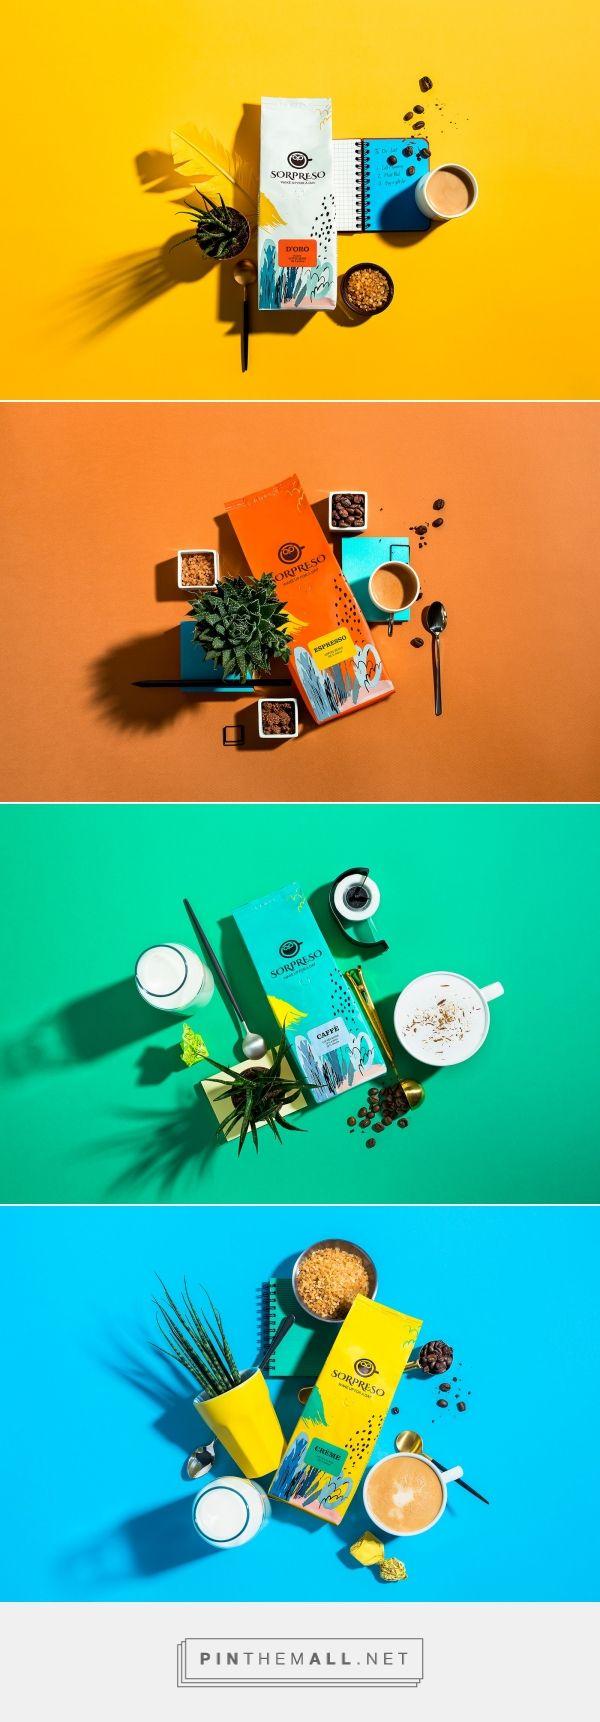 Sorpreso - Packaging of the World - Creative Package Design Gallery - http://www.packagingoftheworld.com/2017/08/sorpreso.html